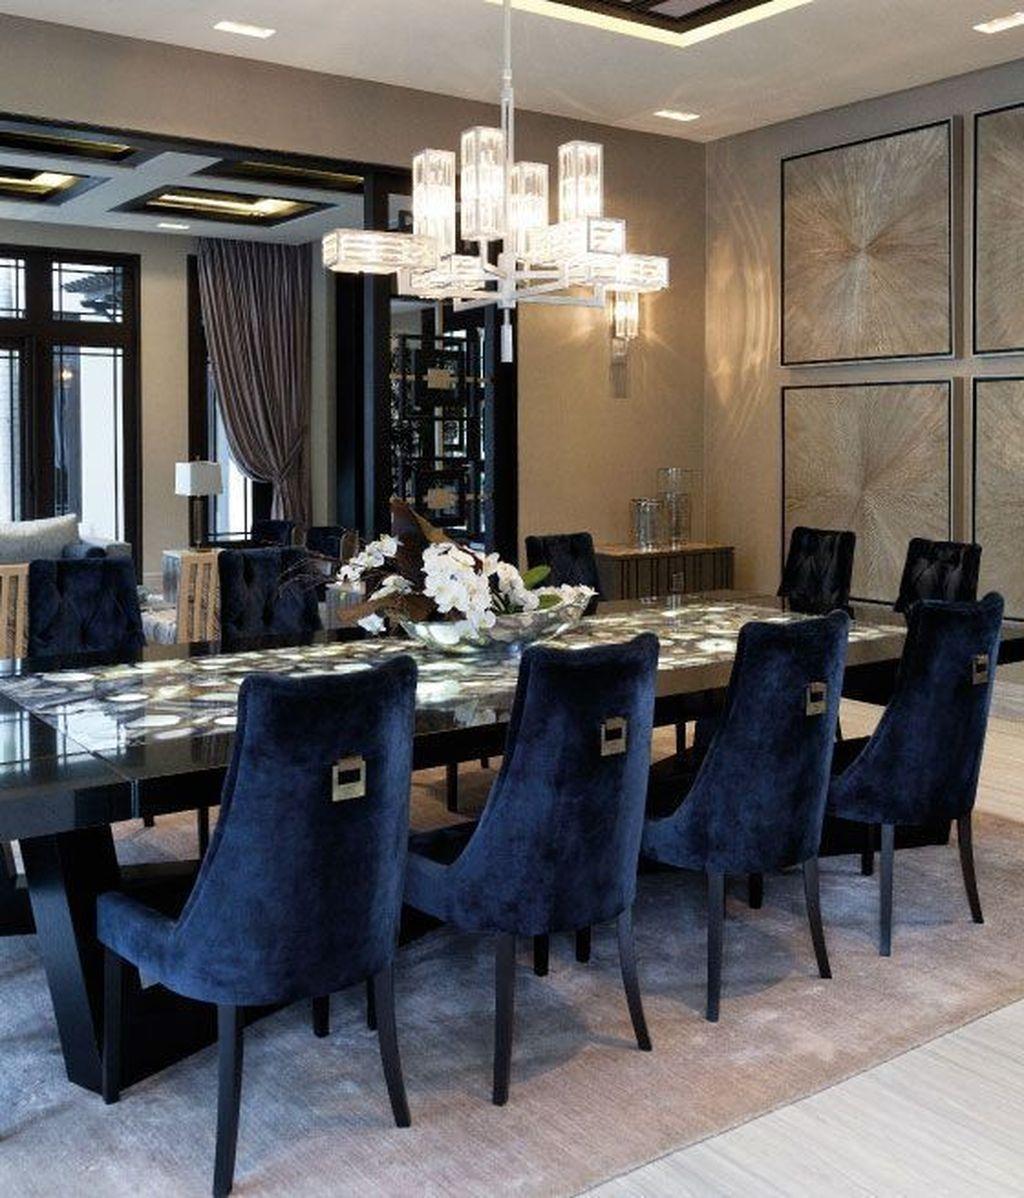 Admirable Dining Room Design Ideas 15